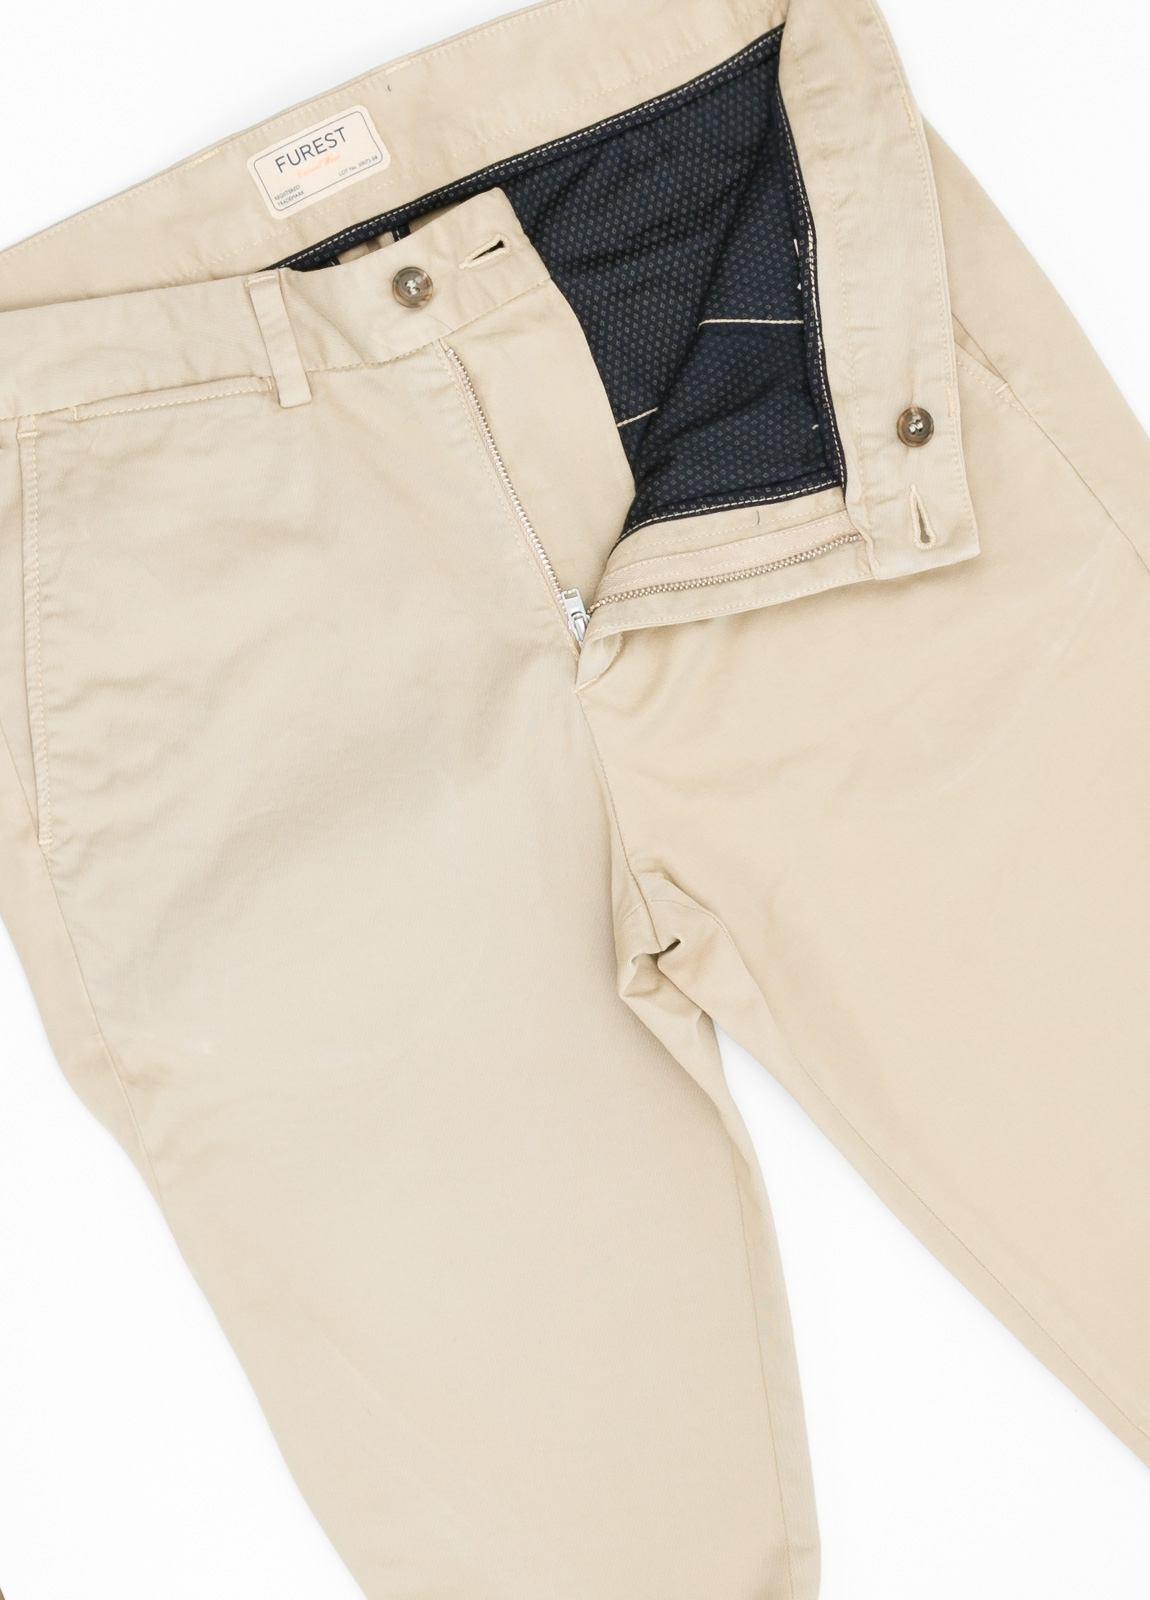 Pantalón Casual Wear, SLIM FIT micro textura color beige, 98% Algodón 2% Elastano. - Ítem2